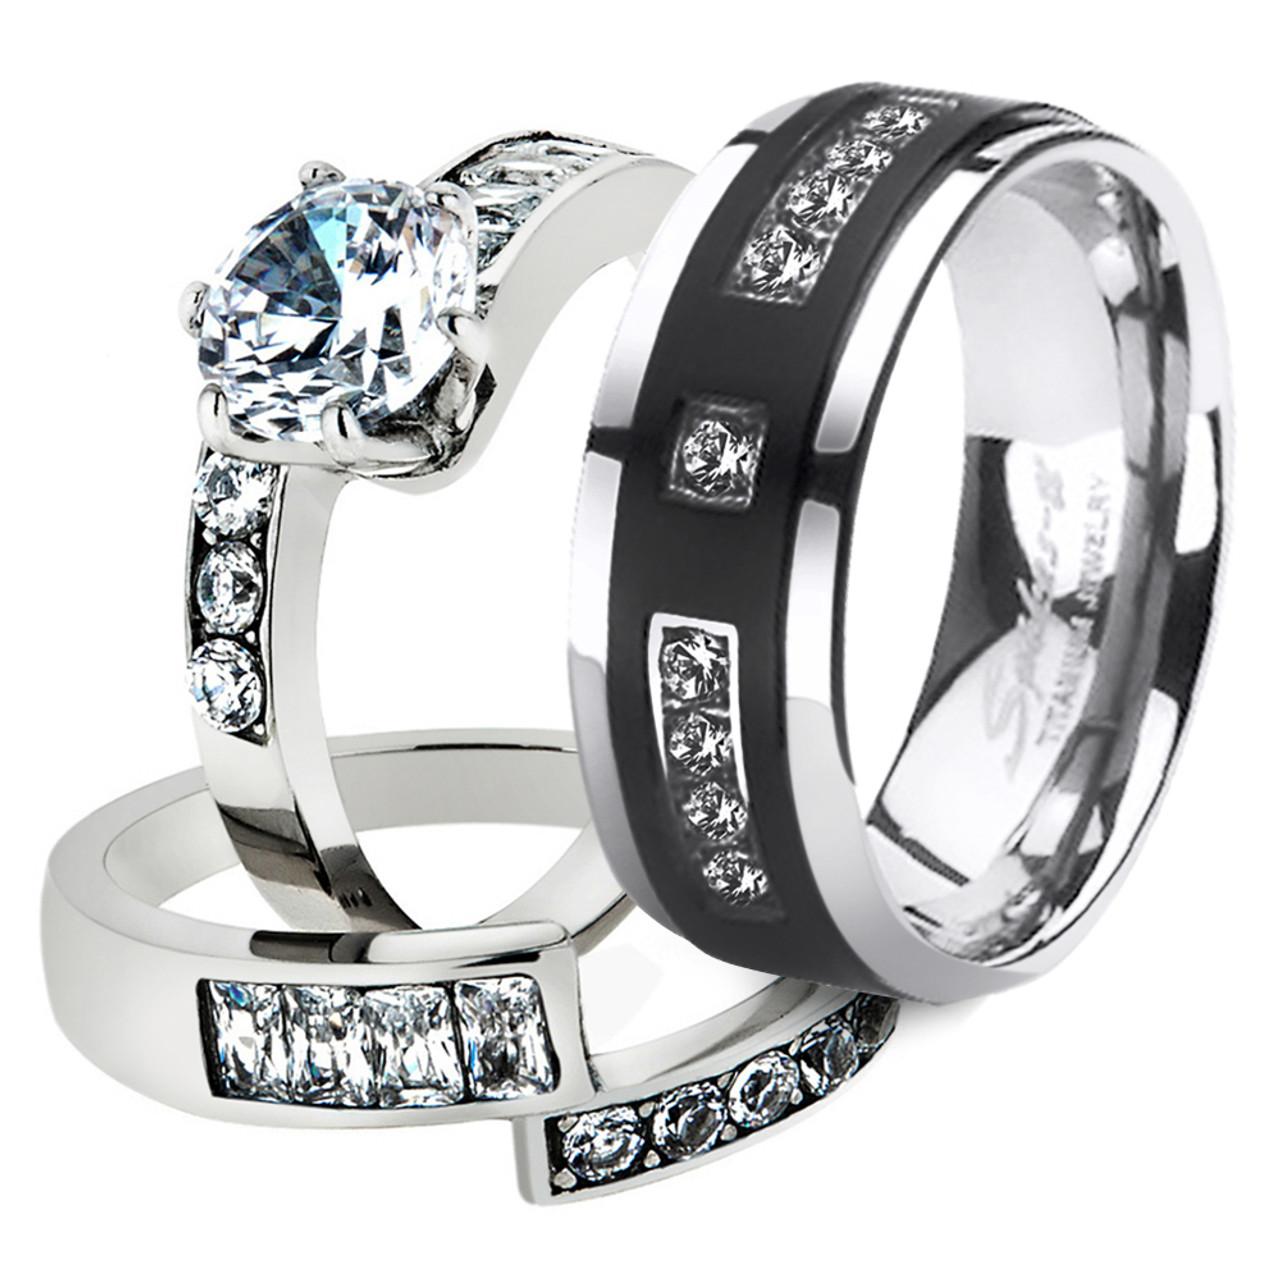 Marimor Jewelry His /& Her 3 Pc Stainless Steel 4.17 Ct Cz Bridal Set /& Men Zirconia Wedding Band